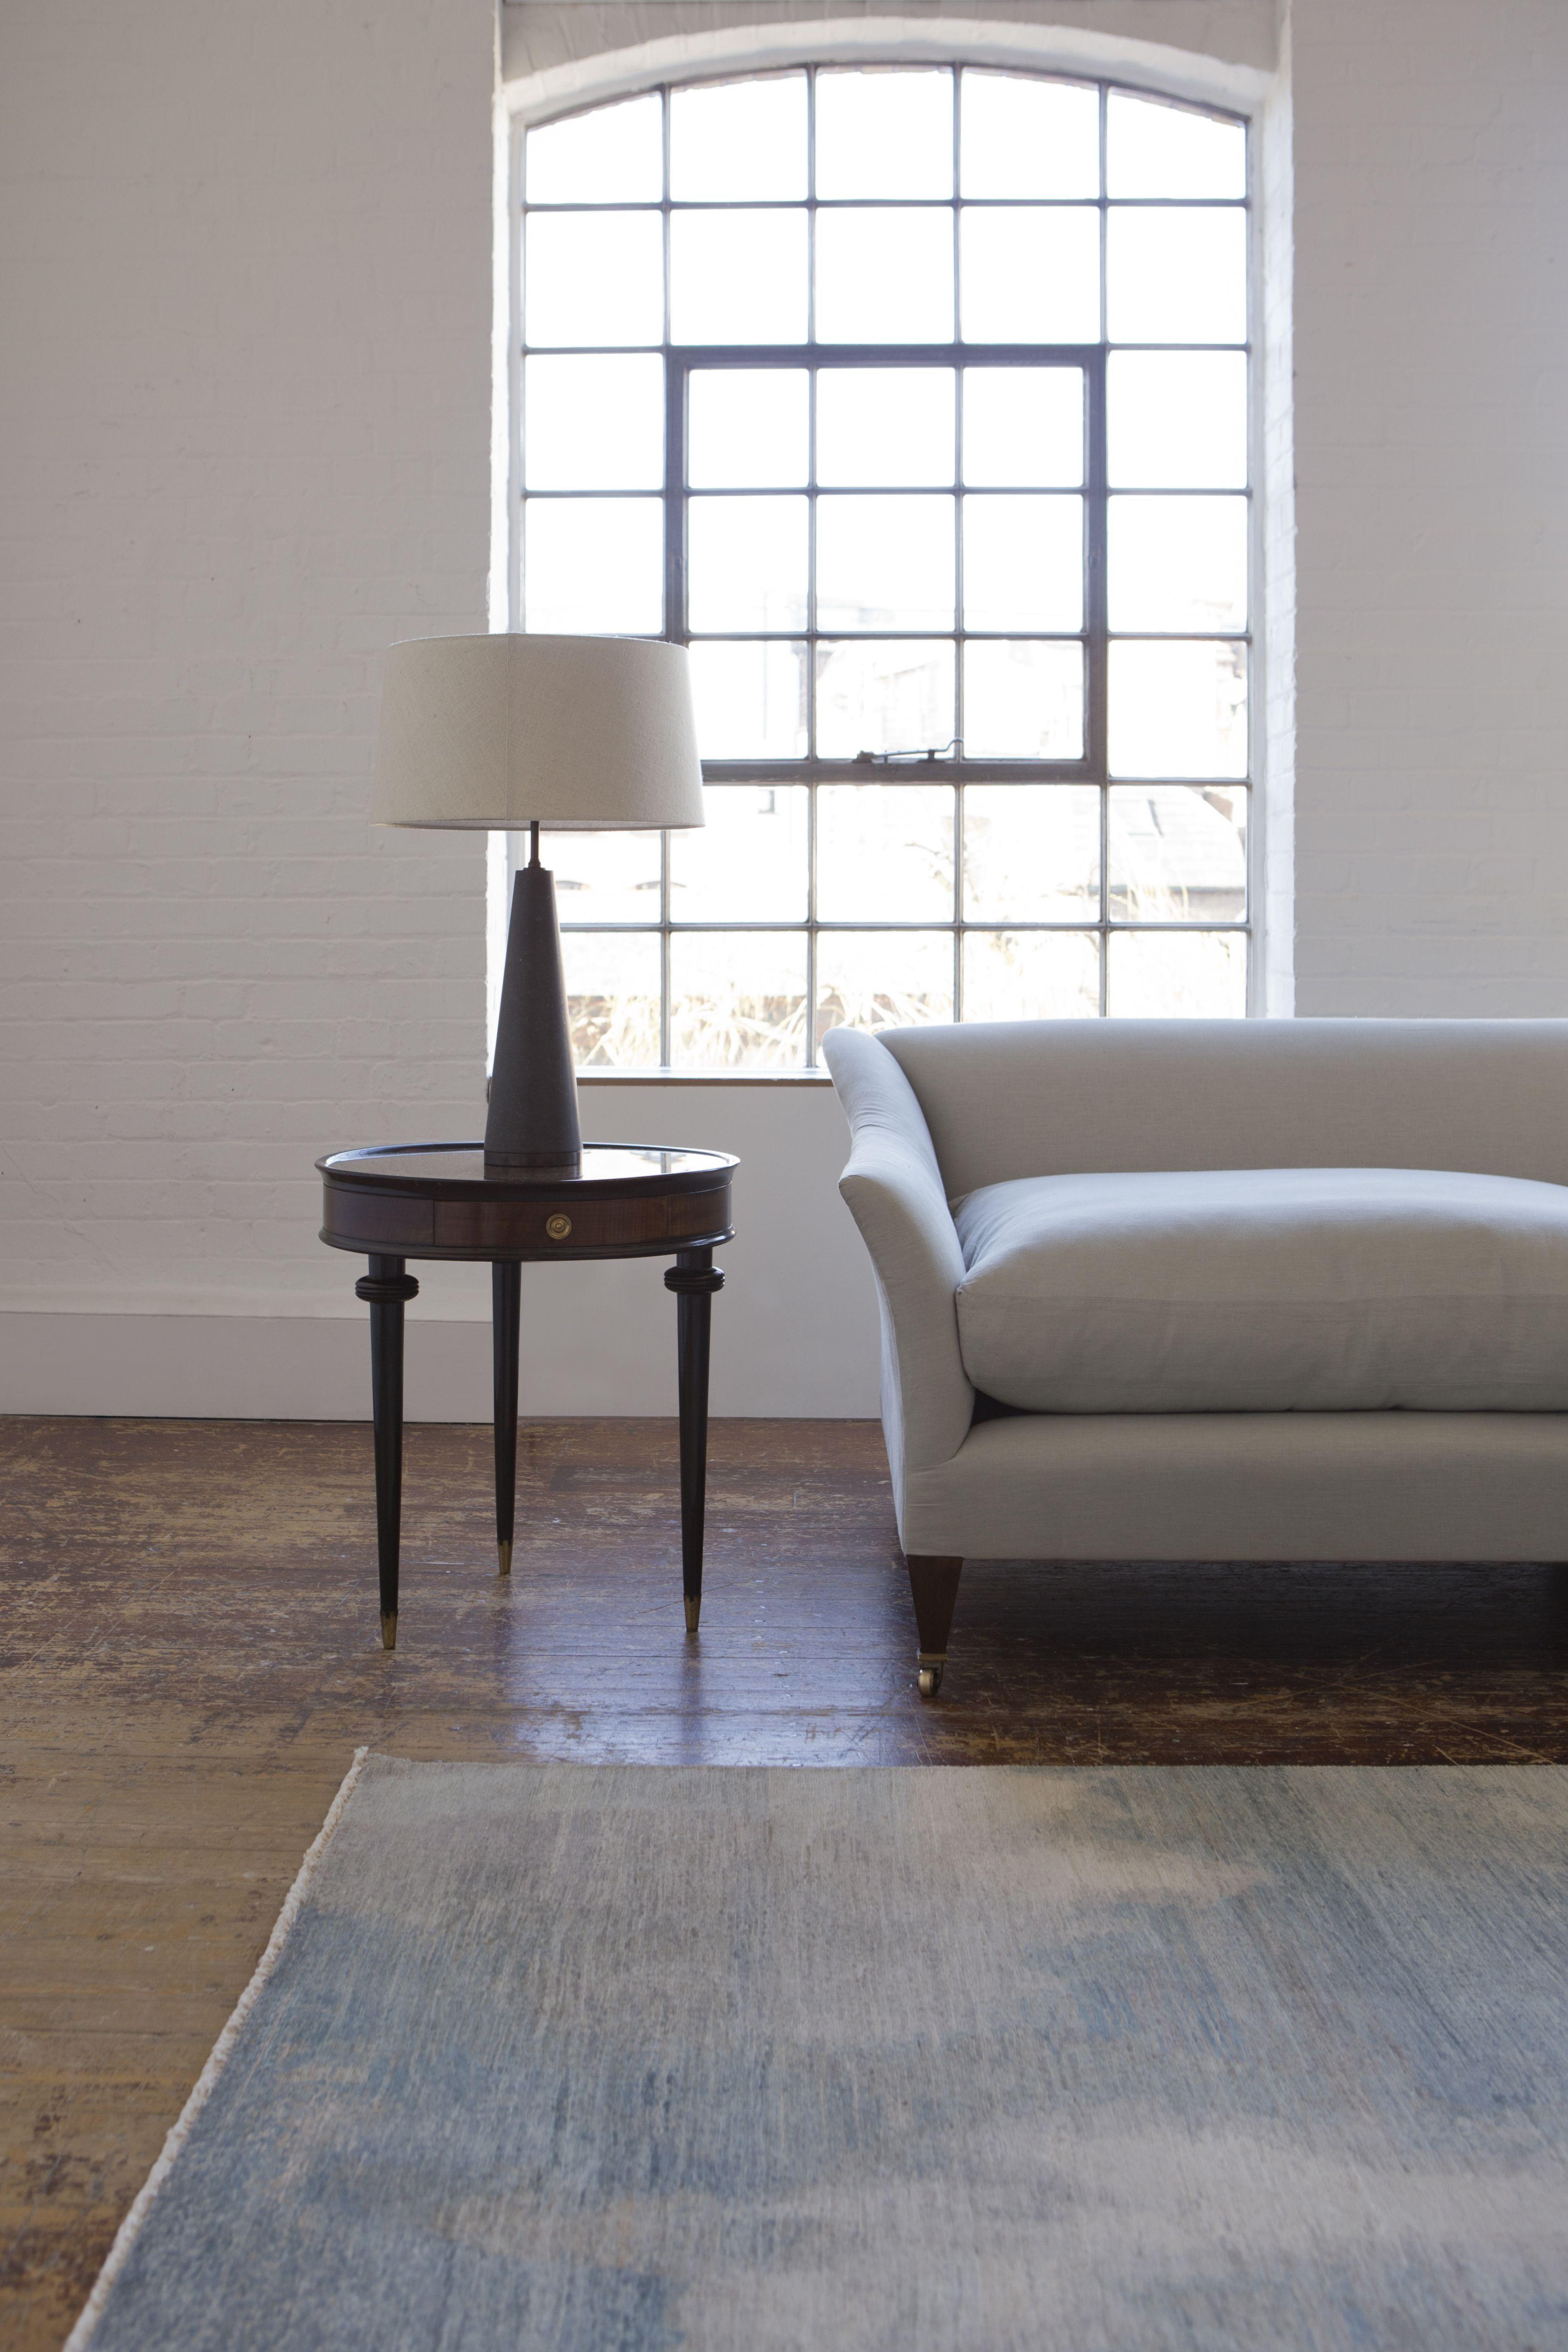 Luke Irwin House Garden The List Contemporaryrugs Contemporary Rugs Design Contemporary Rugs Contemporary Area Rugs